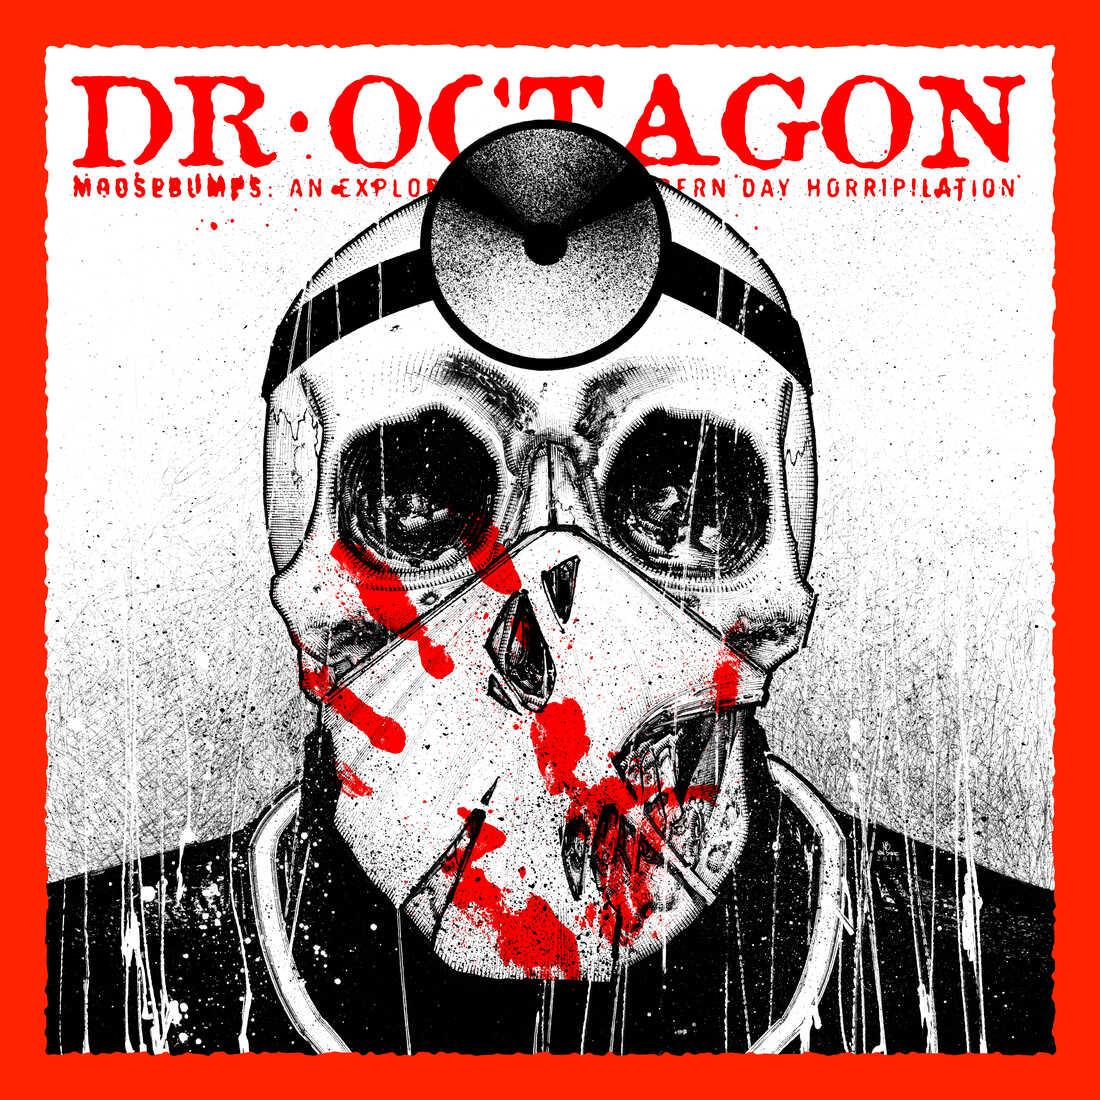 Dr. Octagon, Moosebumps: An Exploration Into Modern Day Horripilation